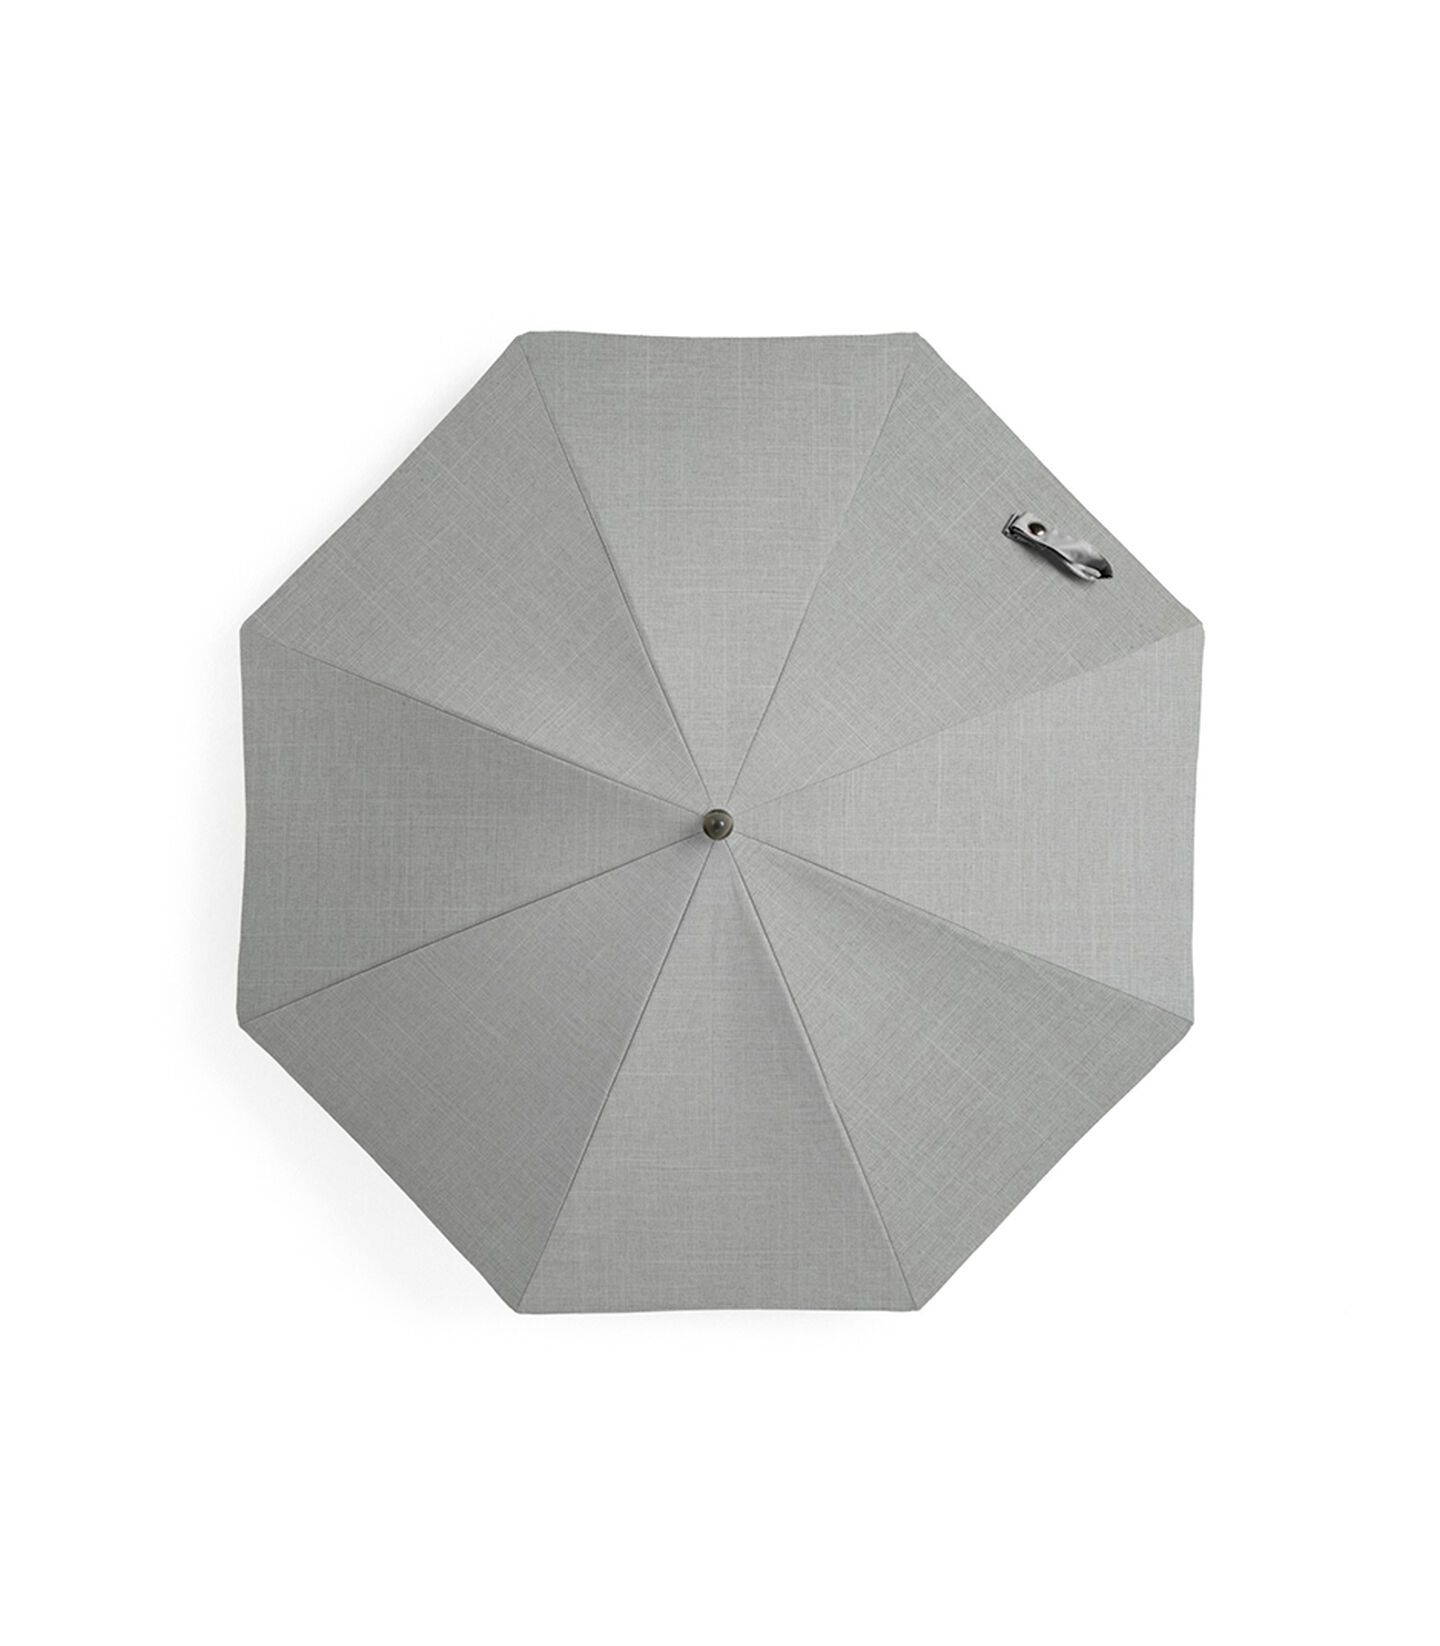 Stokke® Xplory® Black Parasol Grey Melange, Grey Melange, mainview view 1